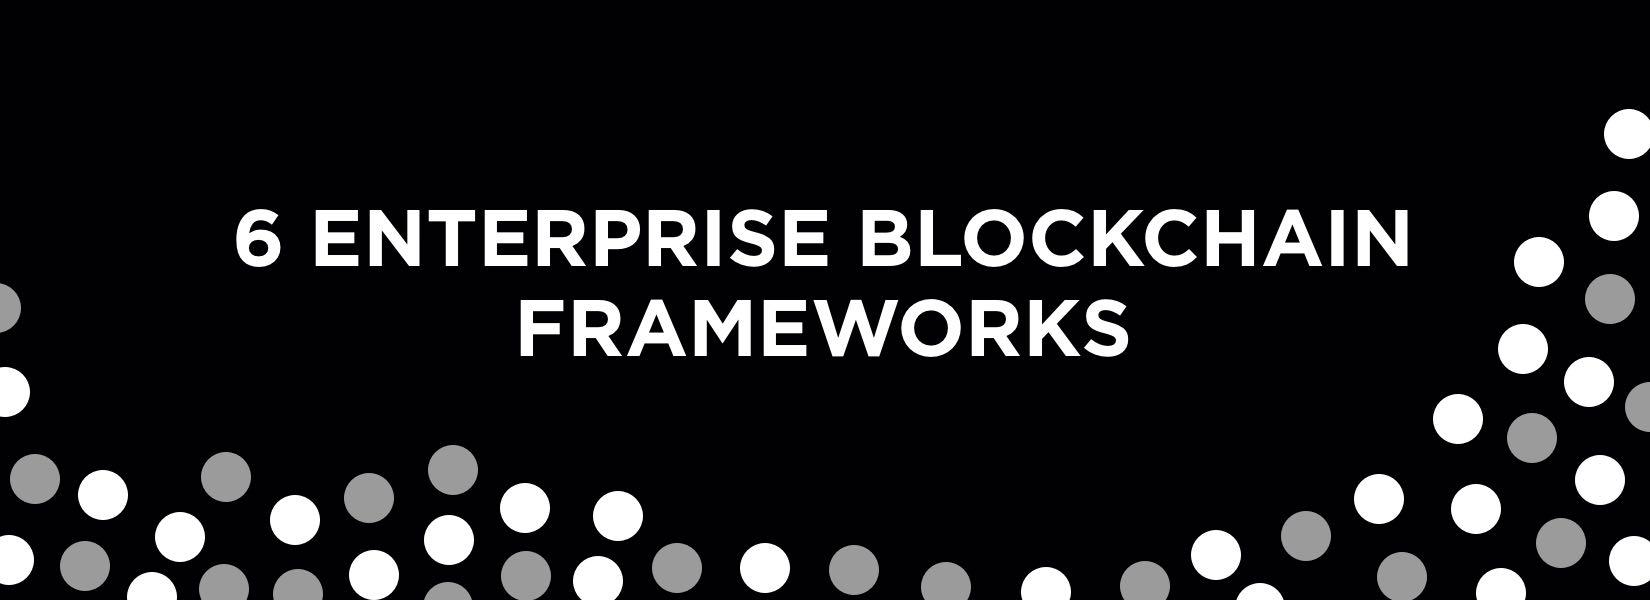 6 Blockchain frameworks to build Enterprise Blockchain & how to choose them?